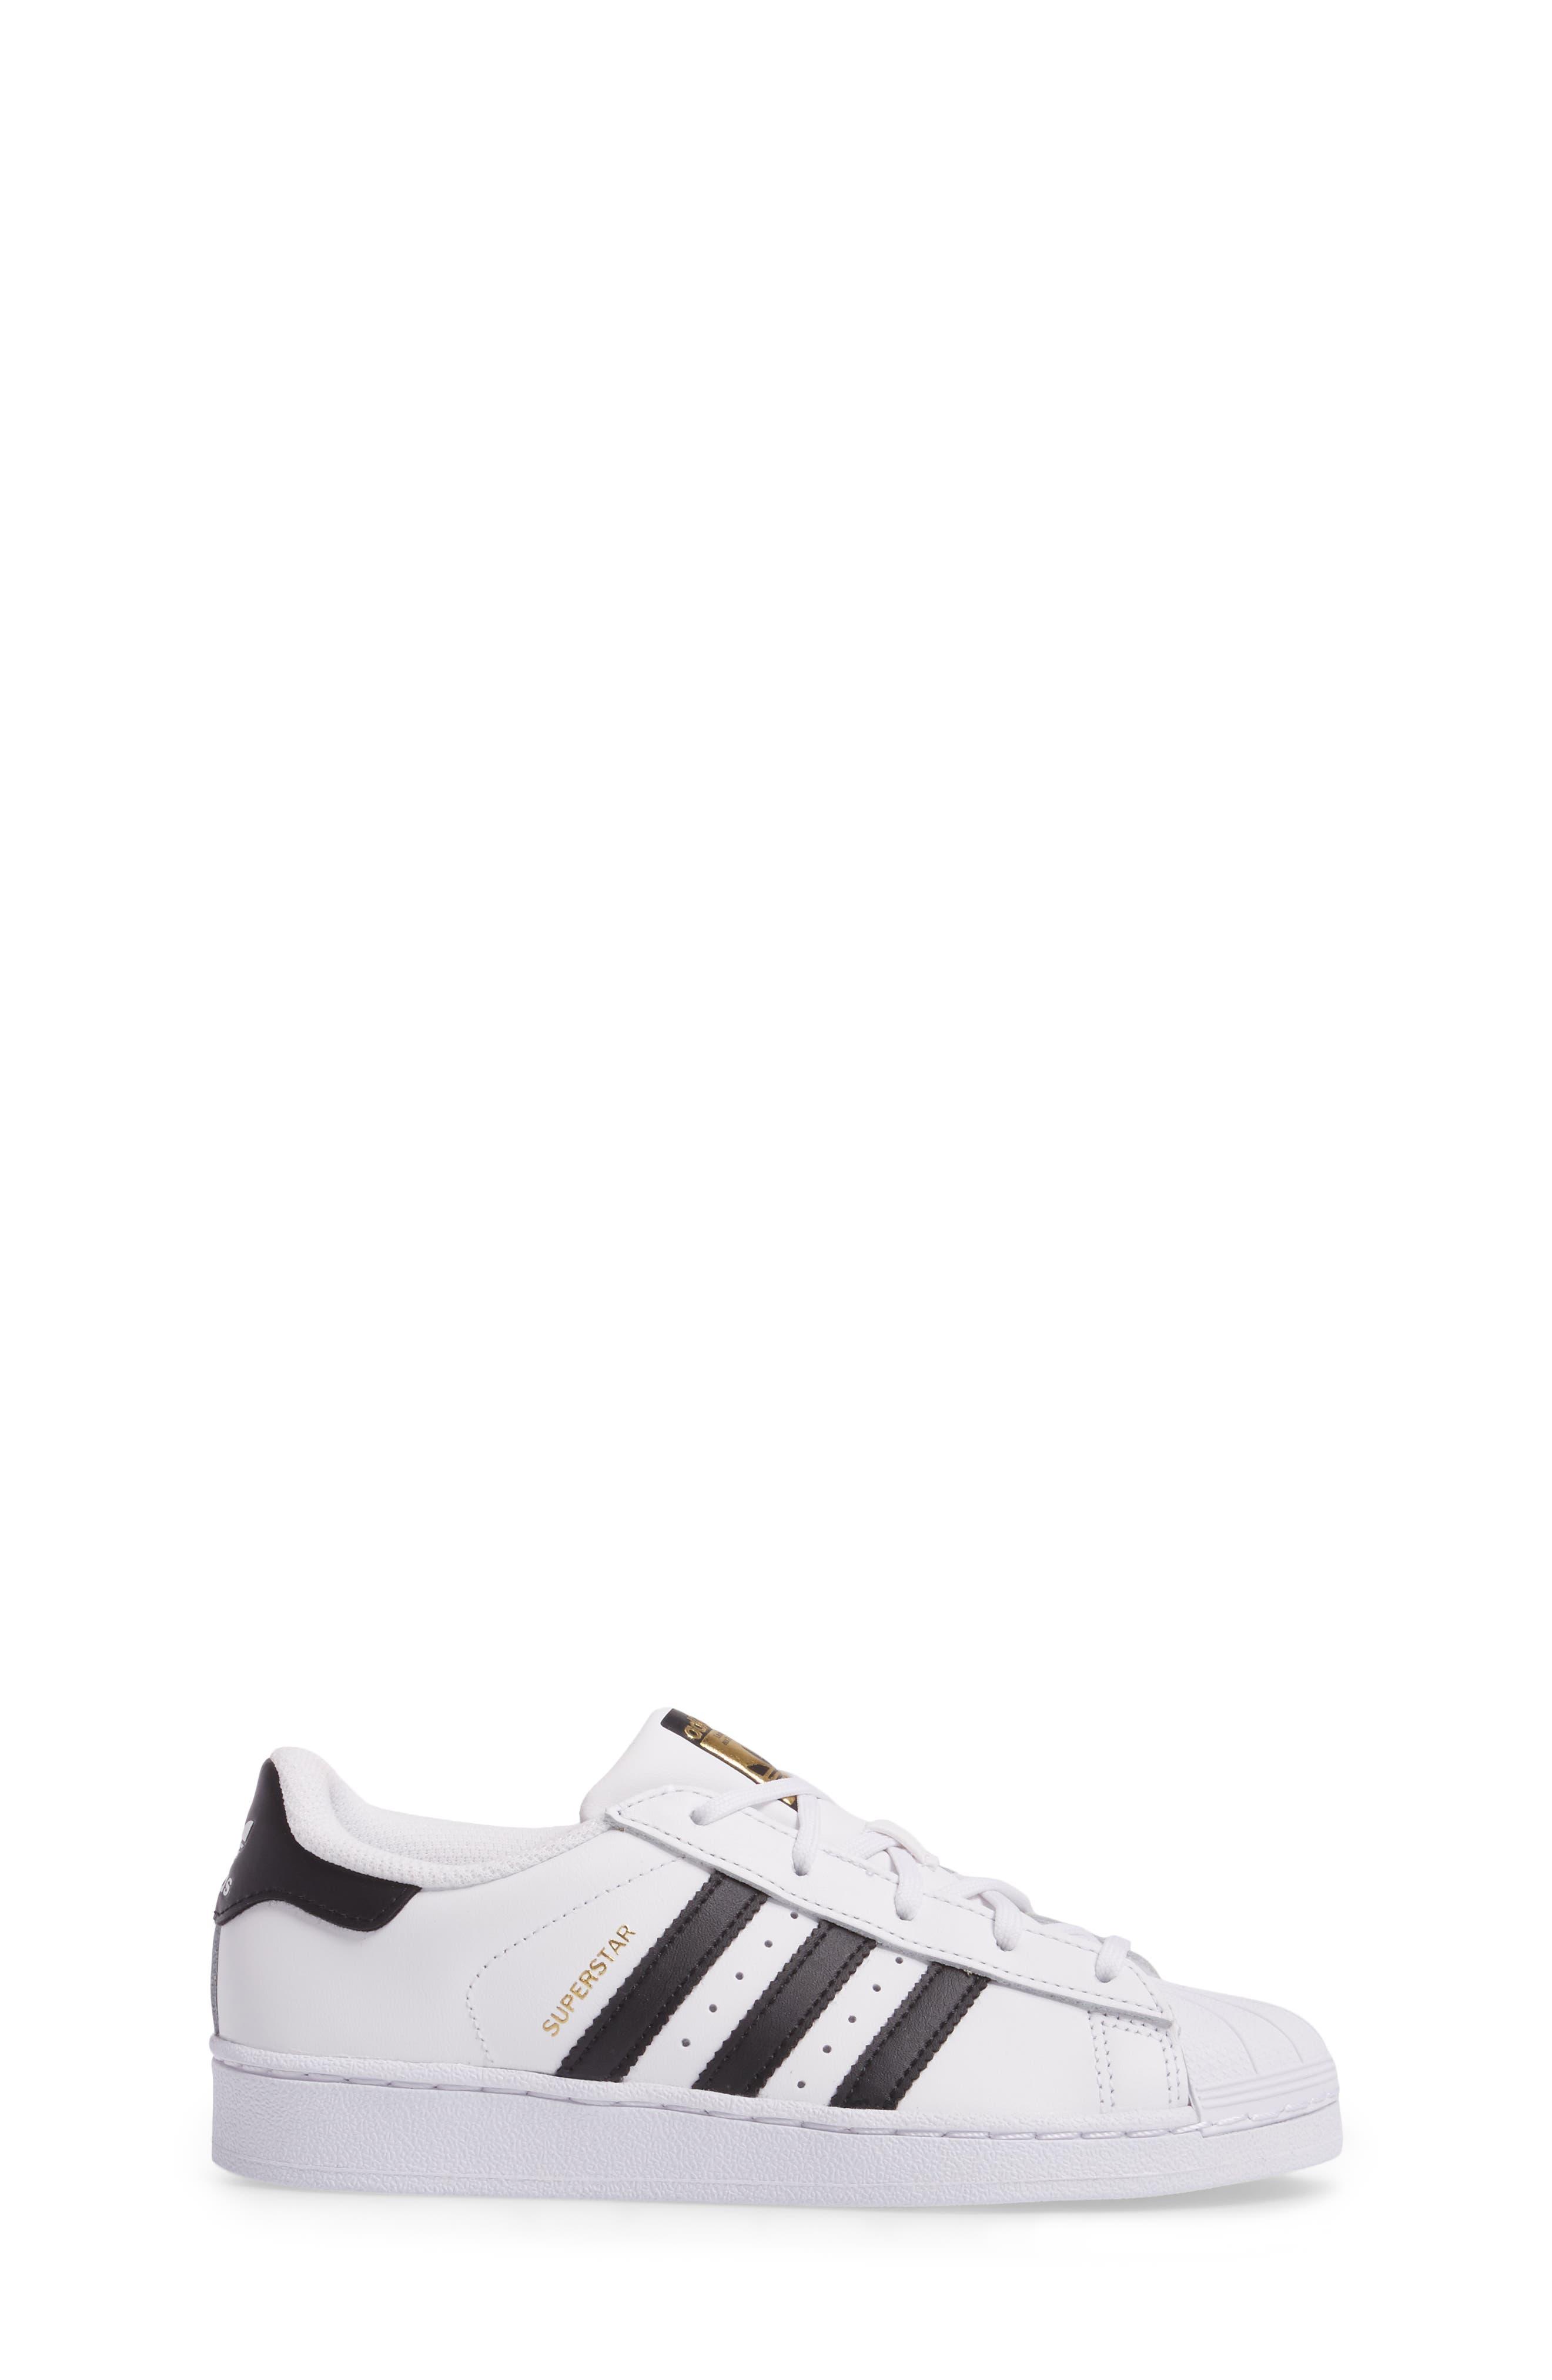 ADIDAS, 'Superstar Foundation' Sneaker, Alternate thumbnail 3, color, WHITE/ BLACK